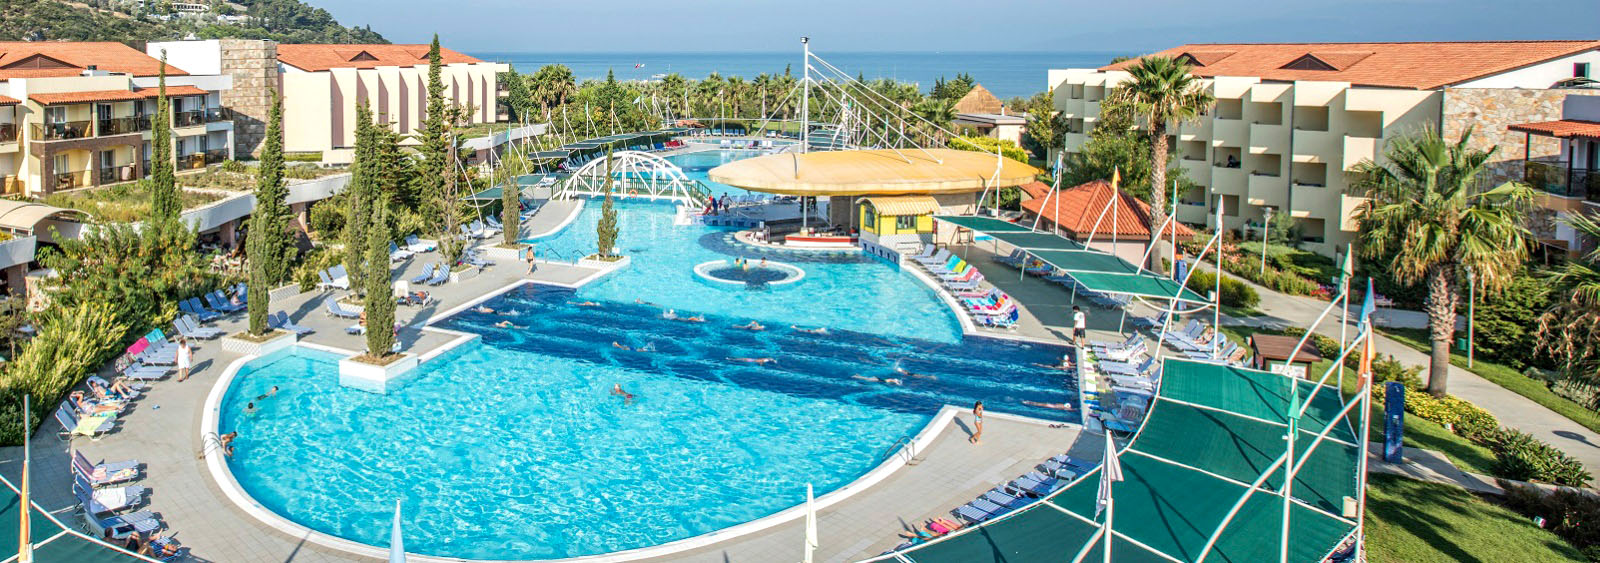 Aqua Fantasy Aquapark Hotel And Spa Kusadasi Turkey